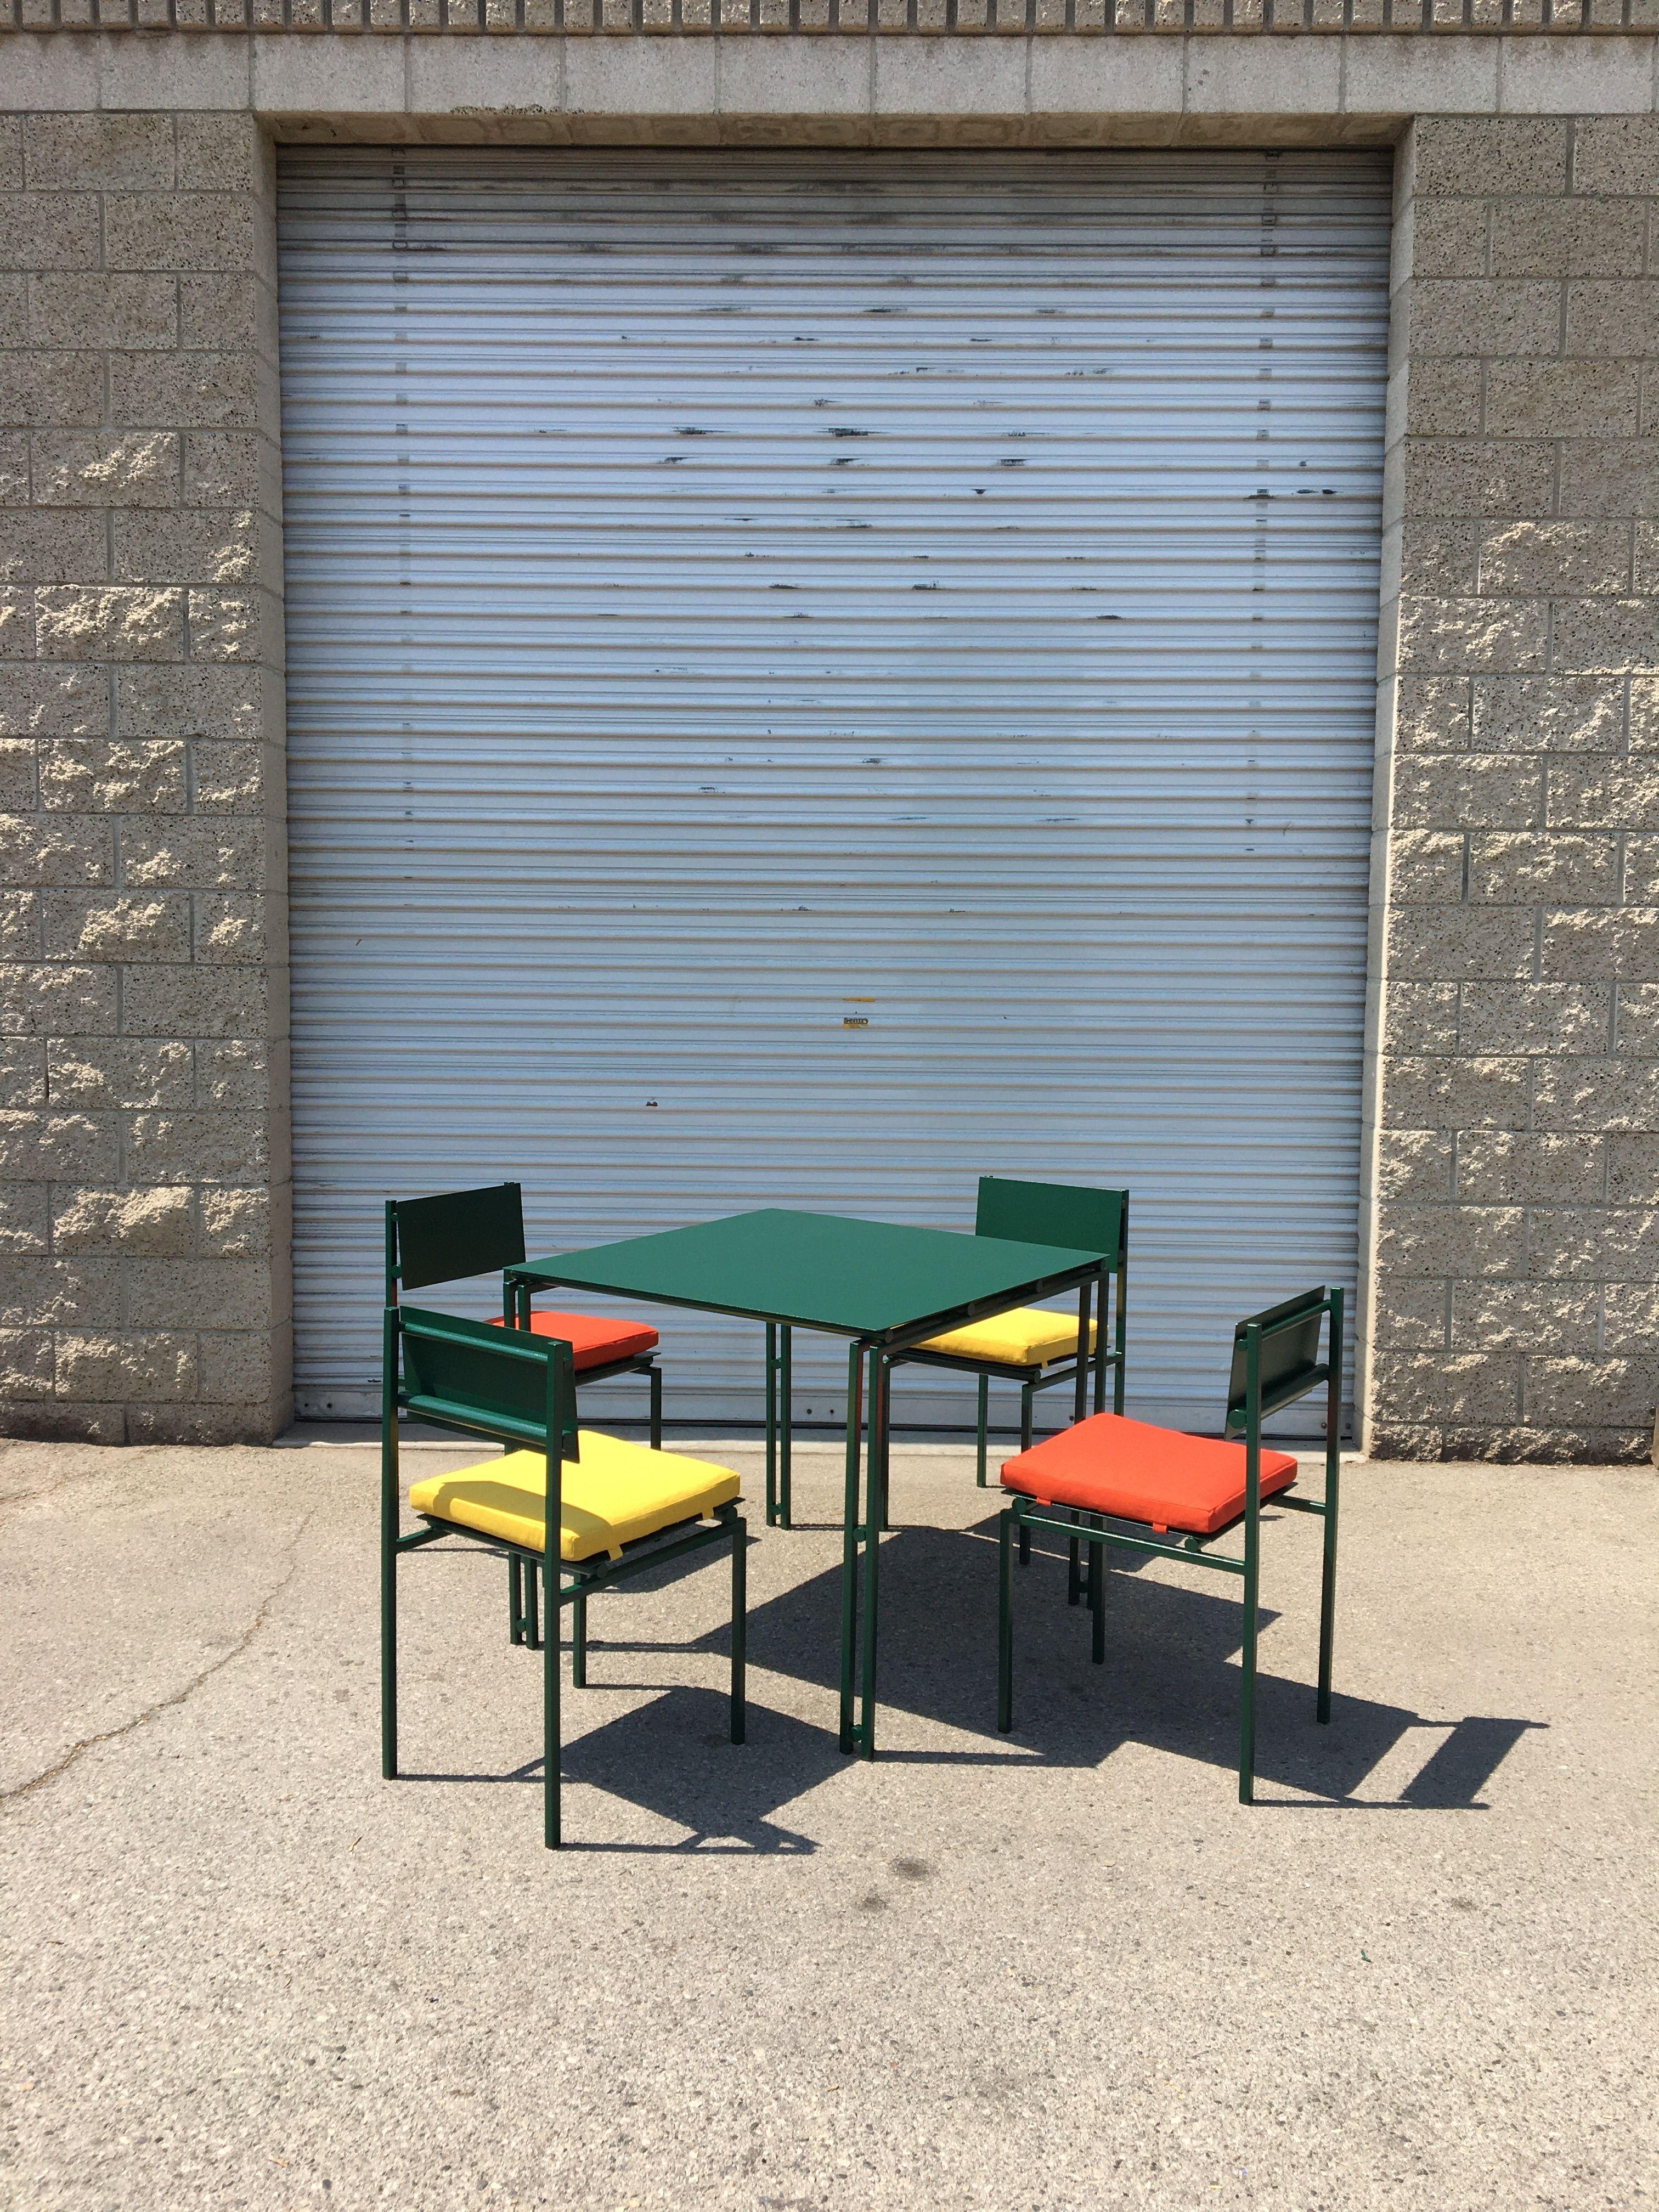 Suspension Metal Set - Breakfast Size product image 1